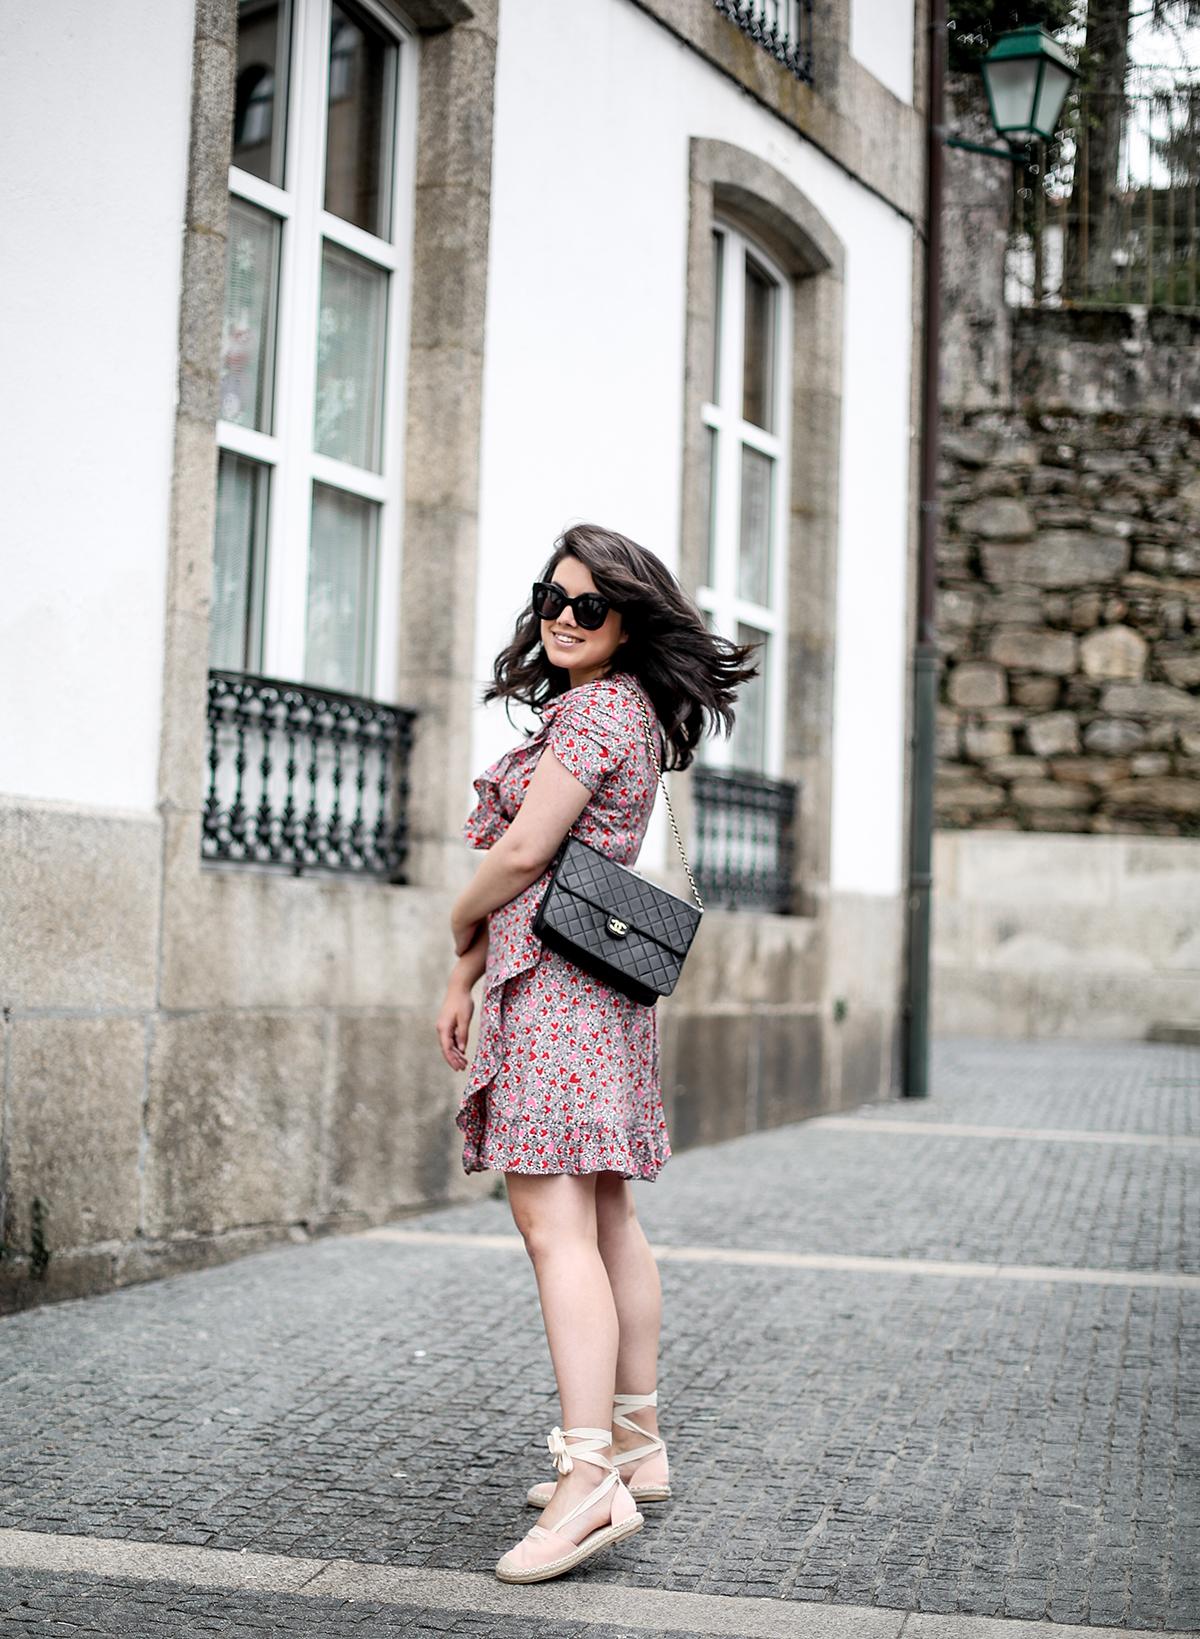 vestido-volantes-cruzado-joanie-clothing-chanel-vintage-alpargatas-shop-cherie9